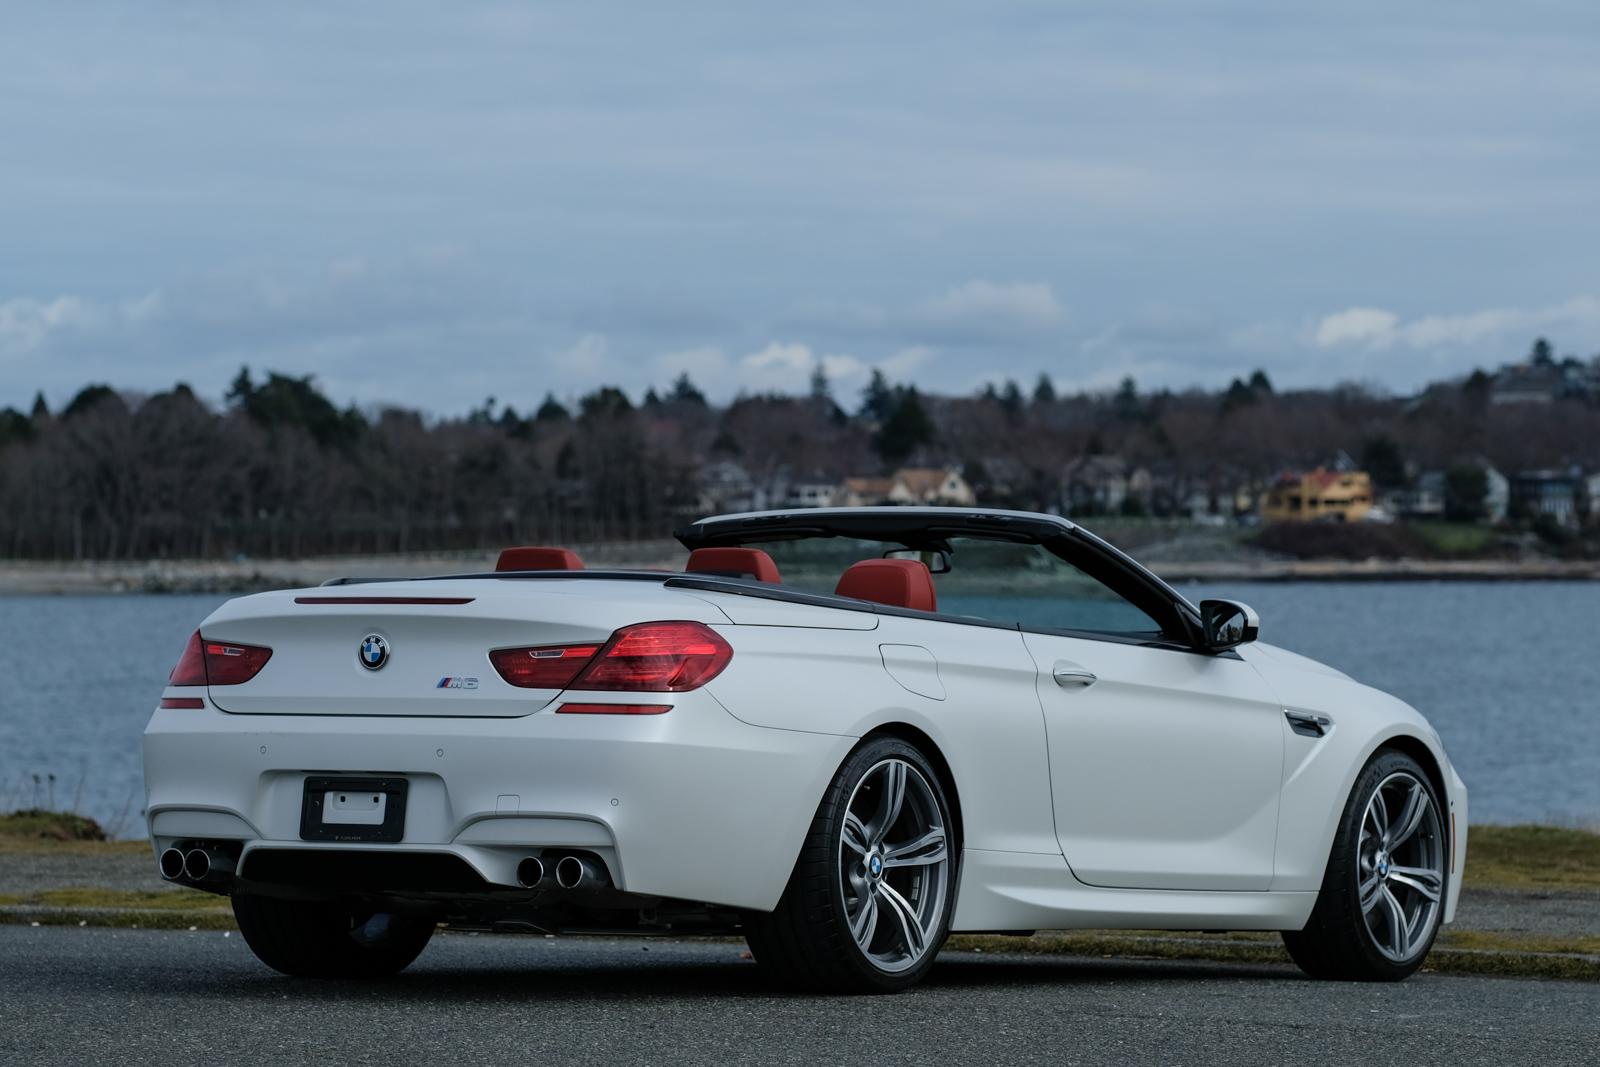 2015 BMW M6 Cabriolet for sale